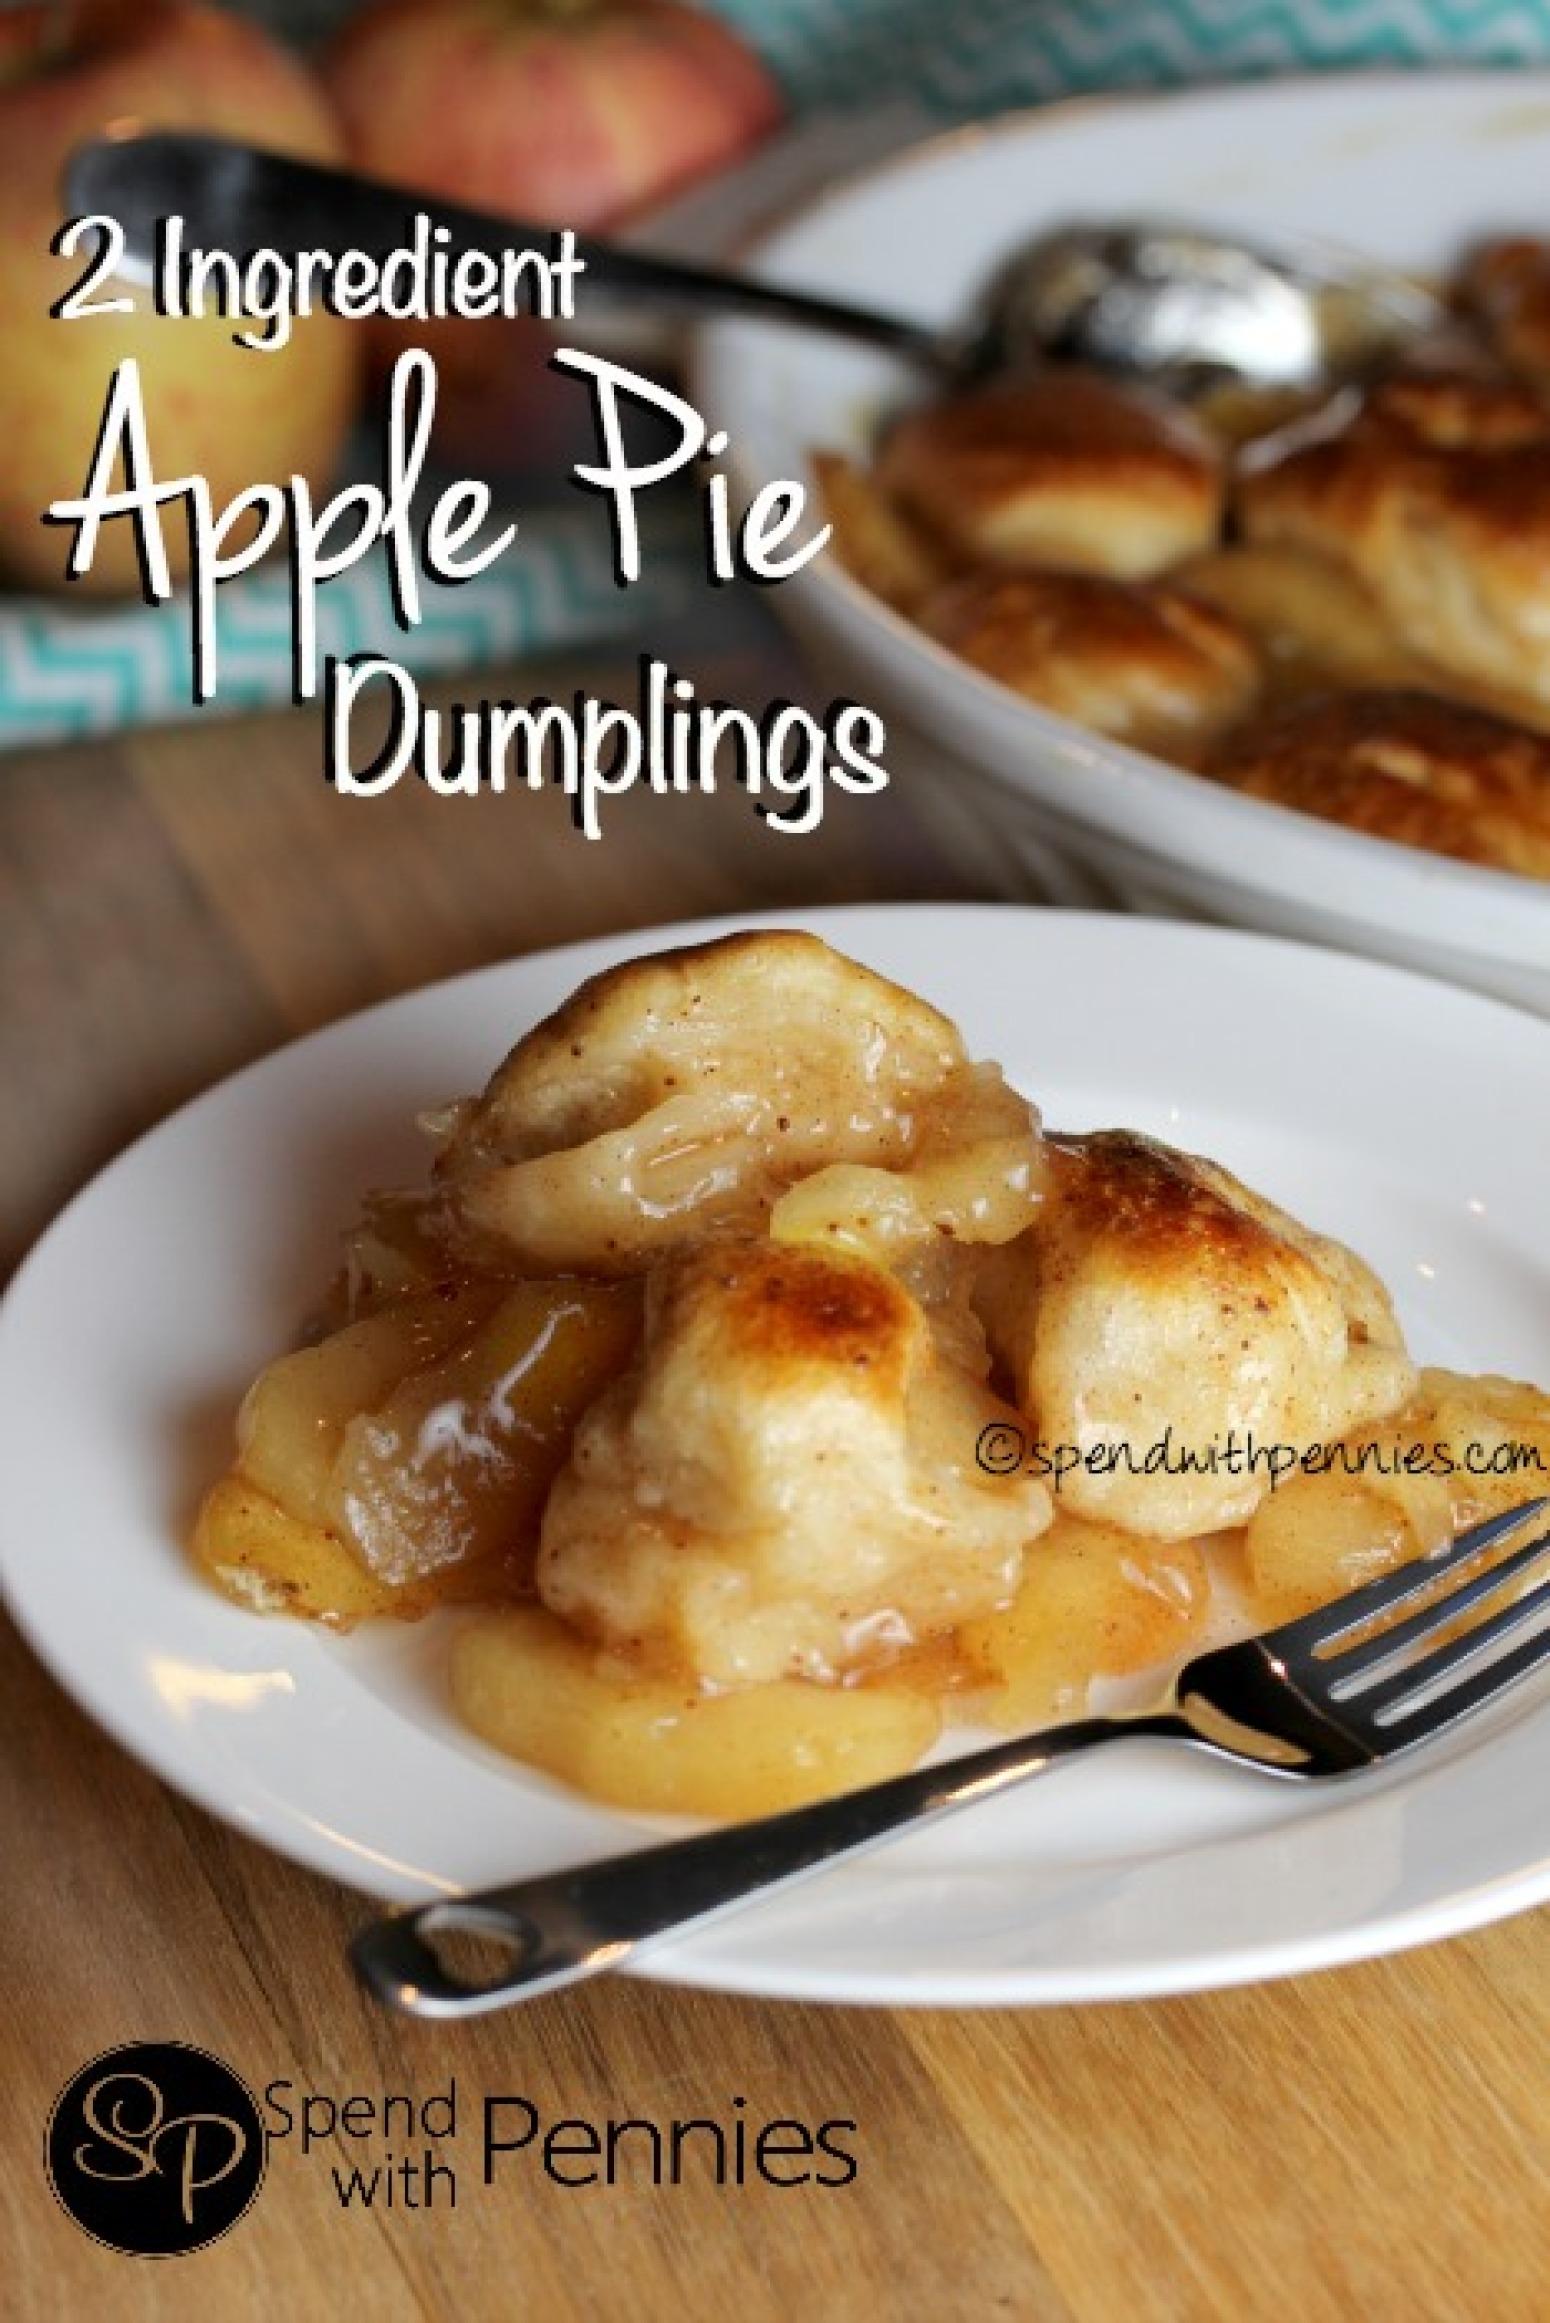 Apple Pie Dumplings 2 Ingredients Recipe 9 | Just A Pinch Recipes